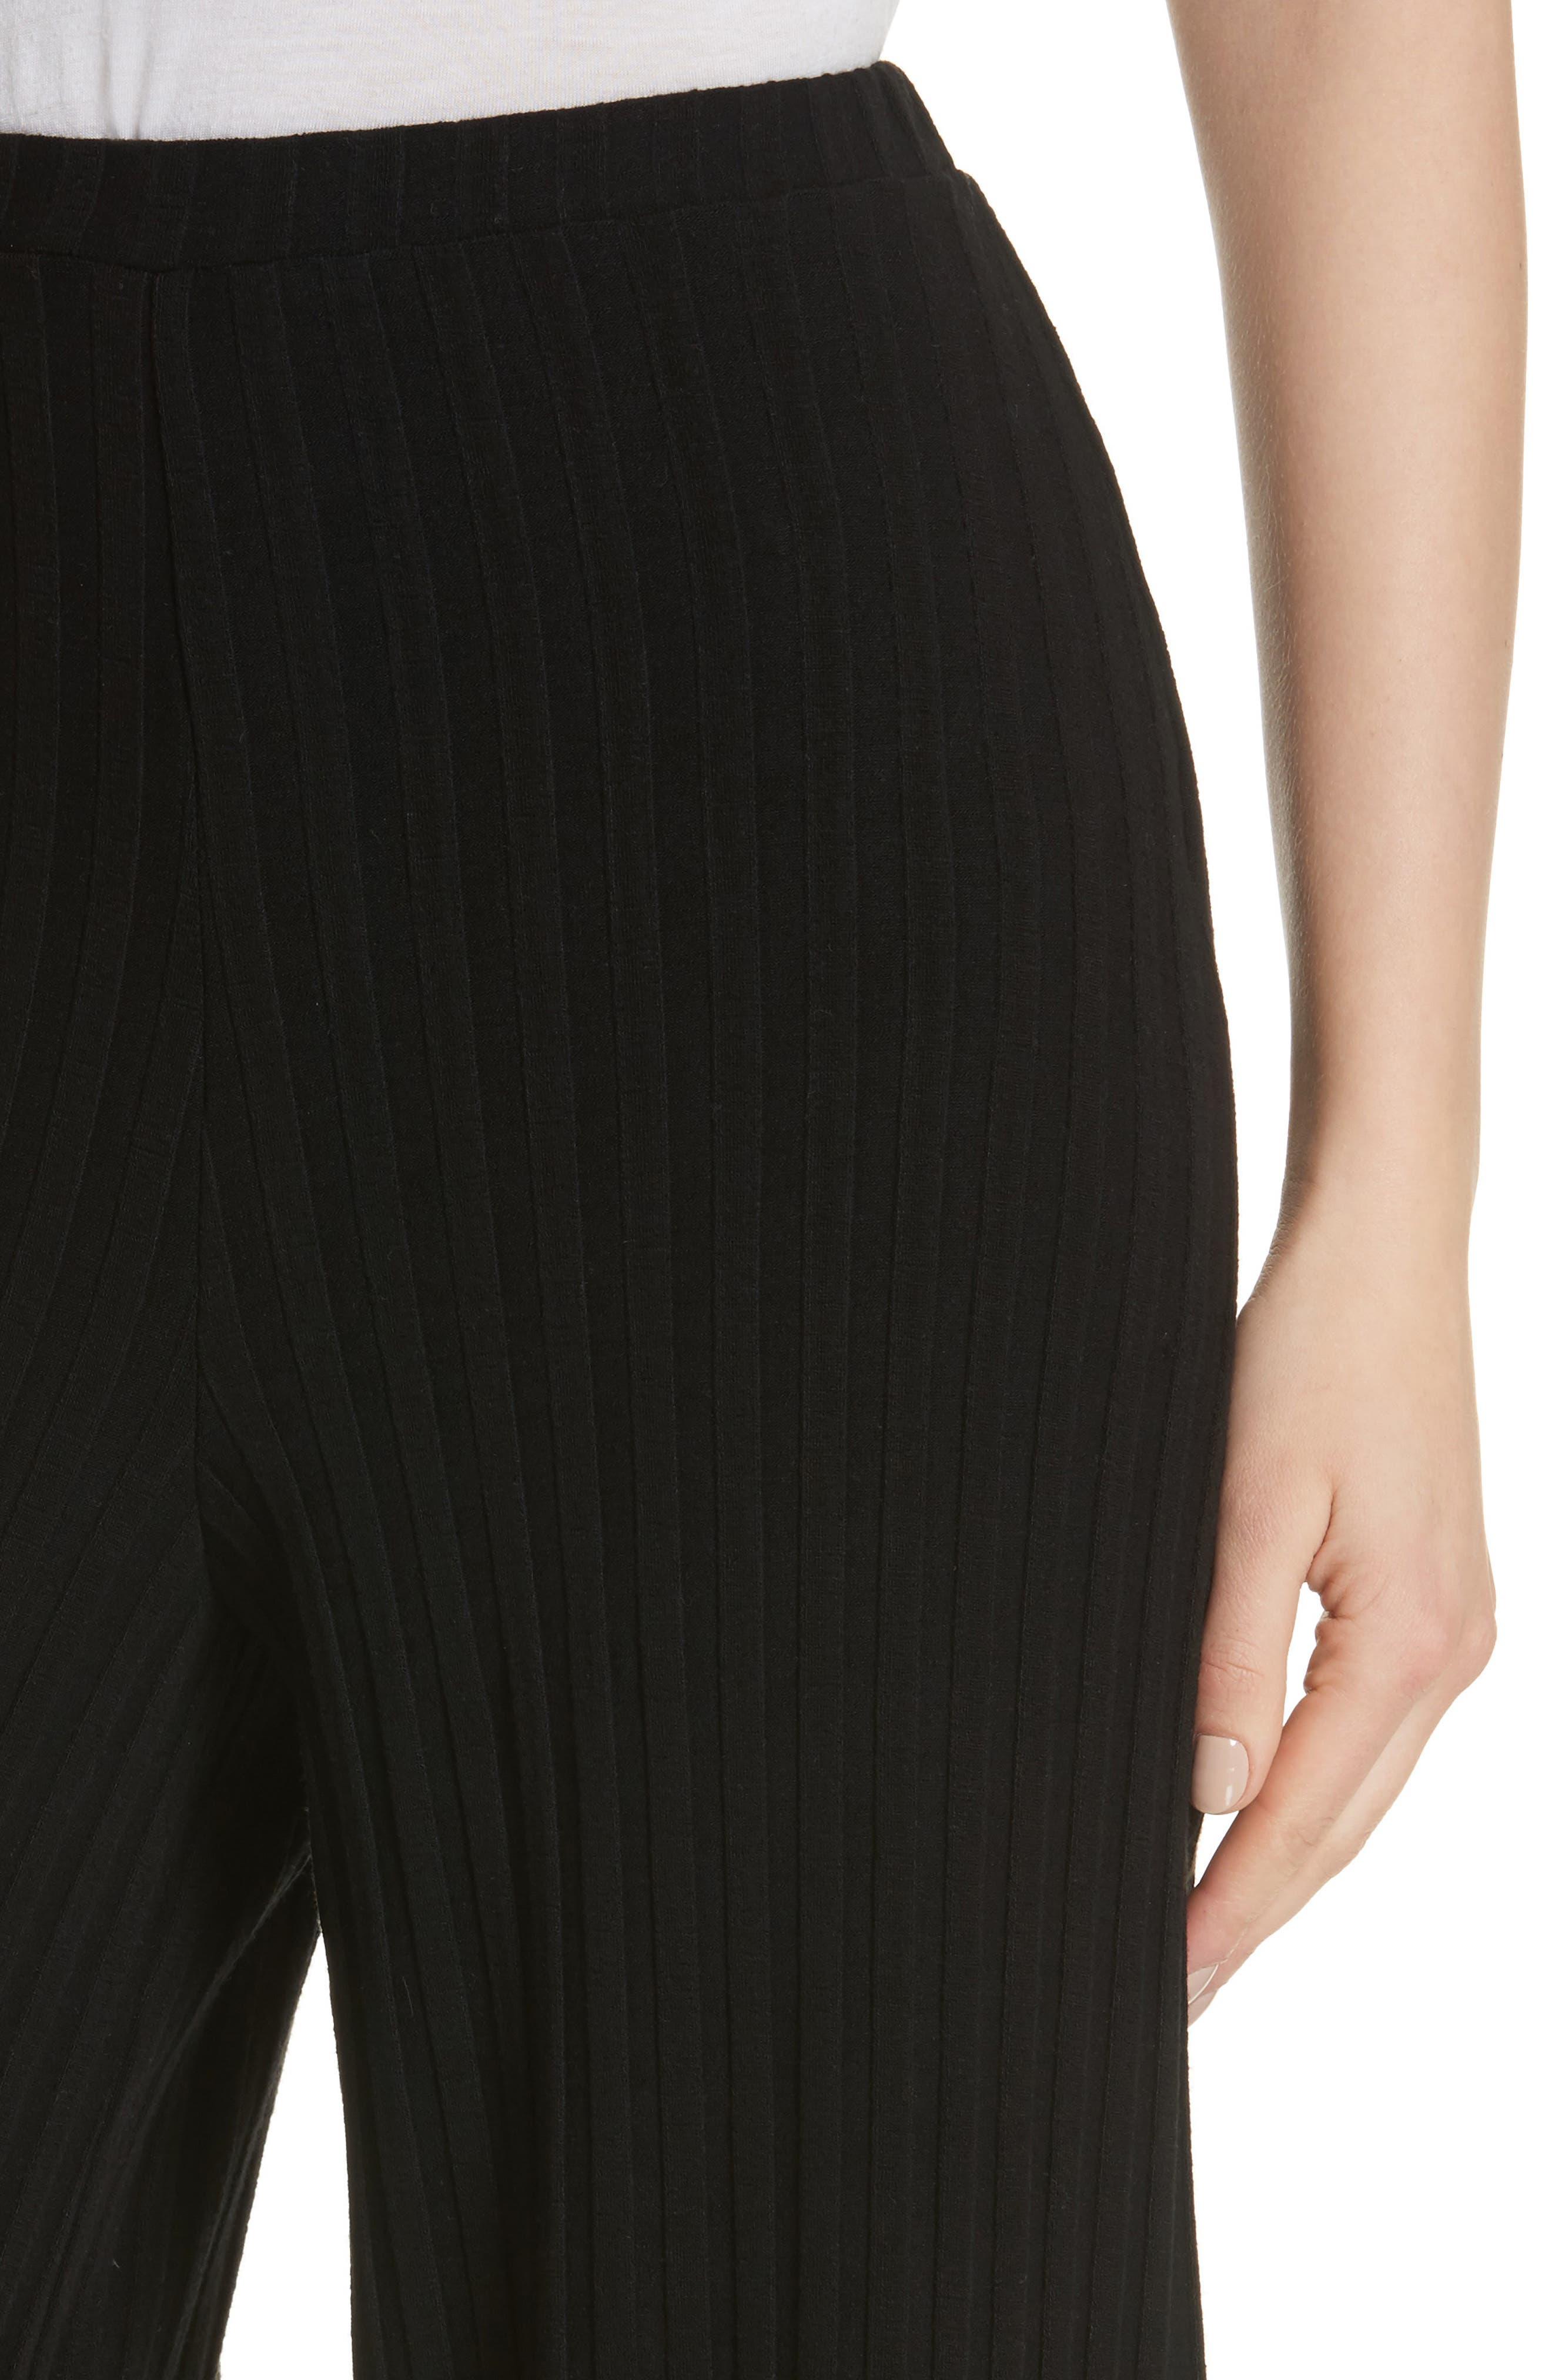 Rian Ribbed Bell Bottom Pants,                             Alternate thumbnail 4, color,                             Black